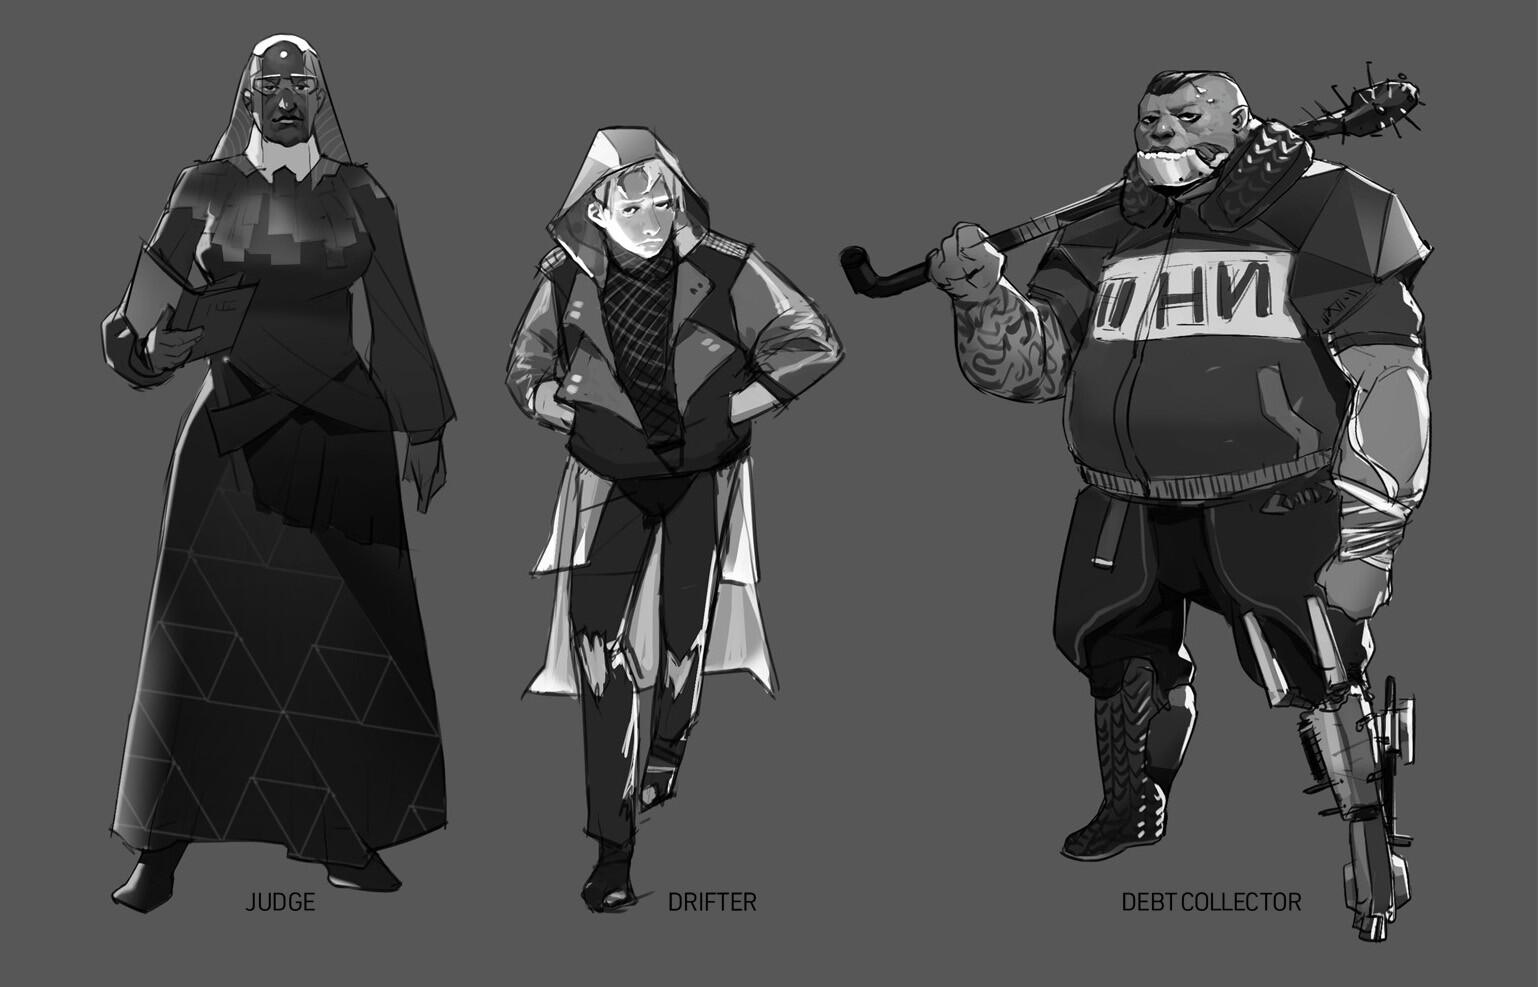 SF/Cyberpunk character exploration